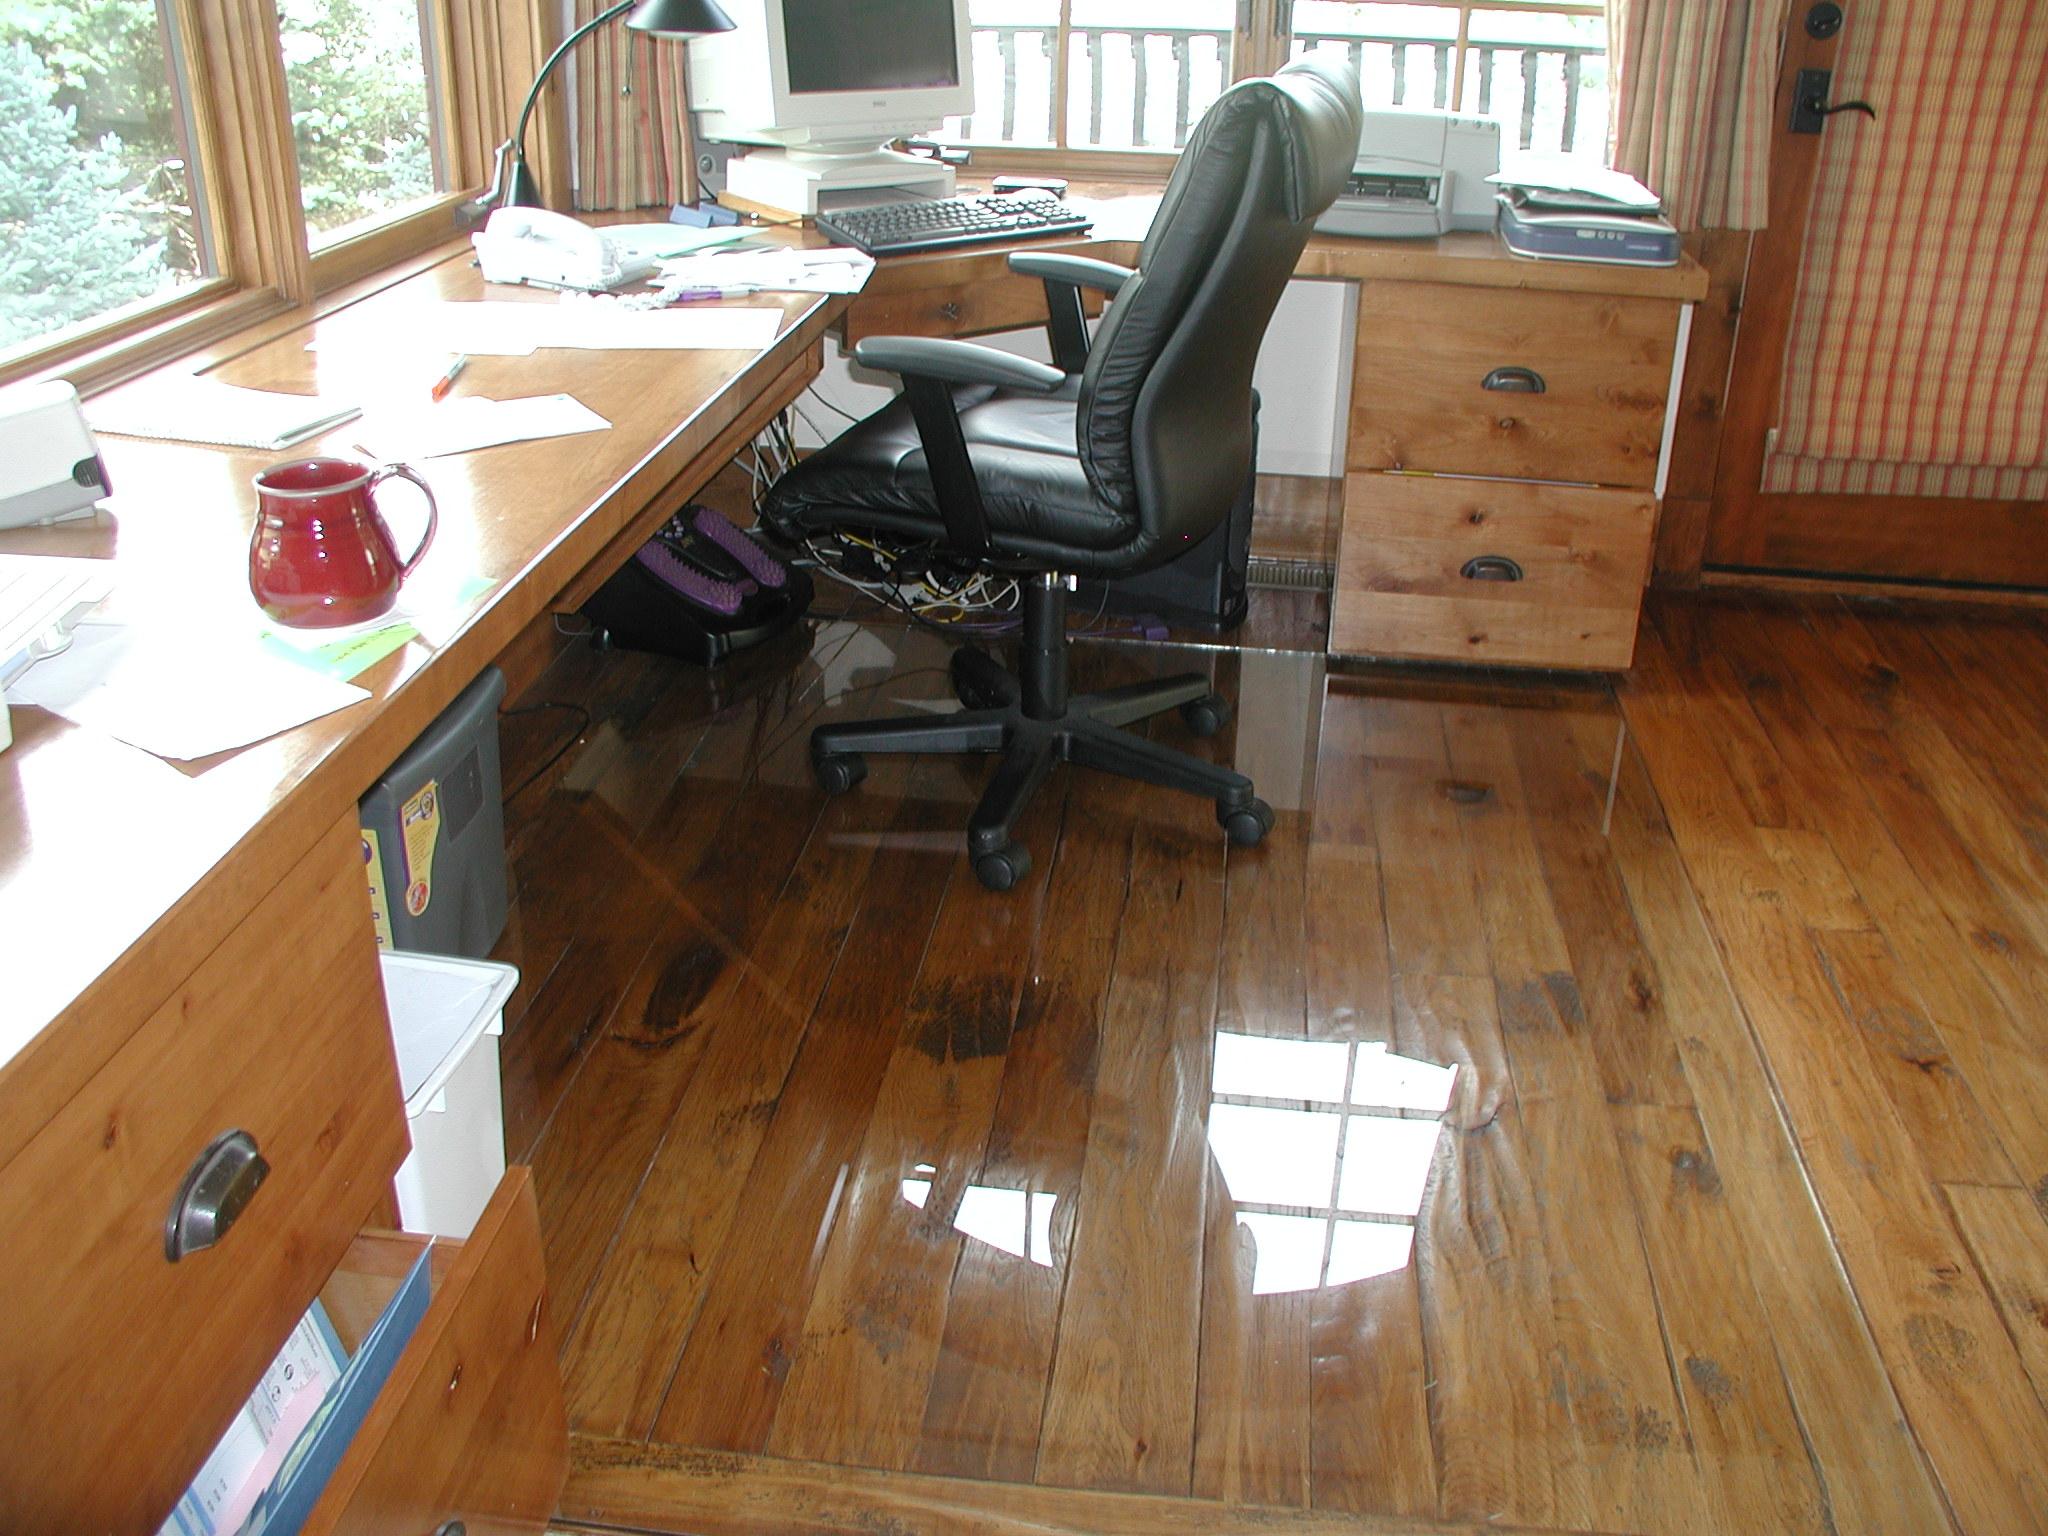 Transpa Floor Mats For Wooden Floors